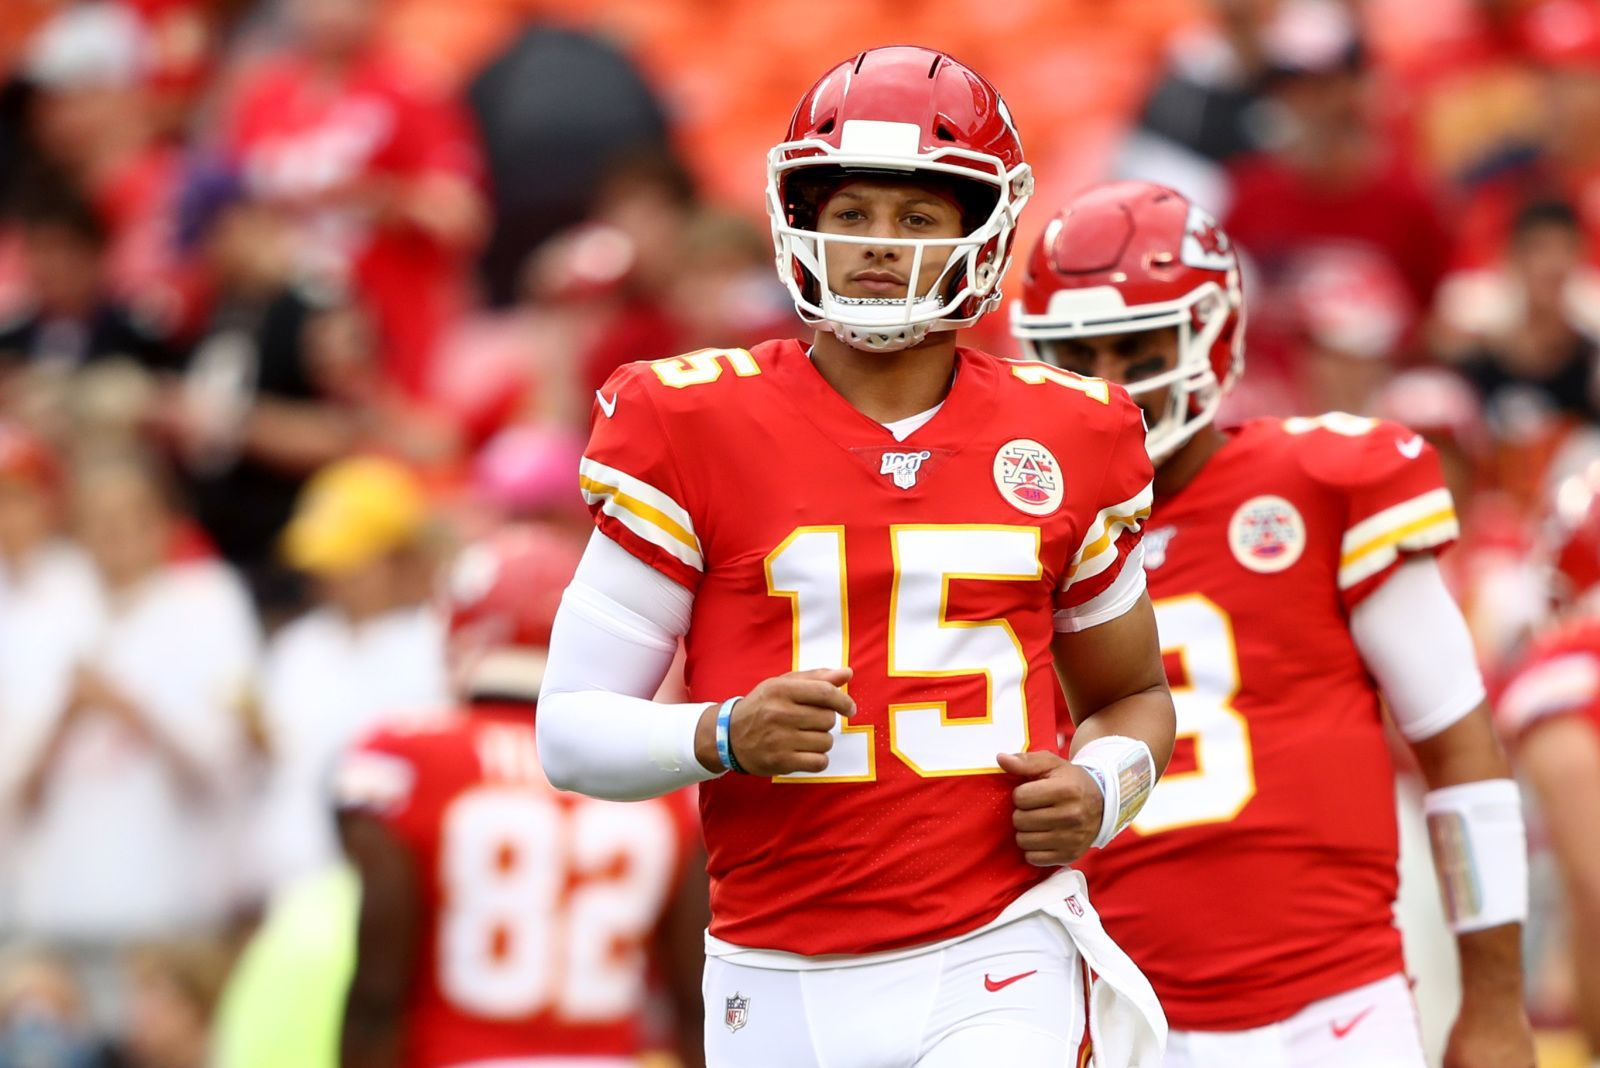 NFL Playoff Bracket 2019 Predicting Super Bowl winner